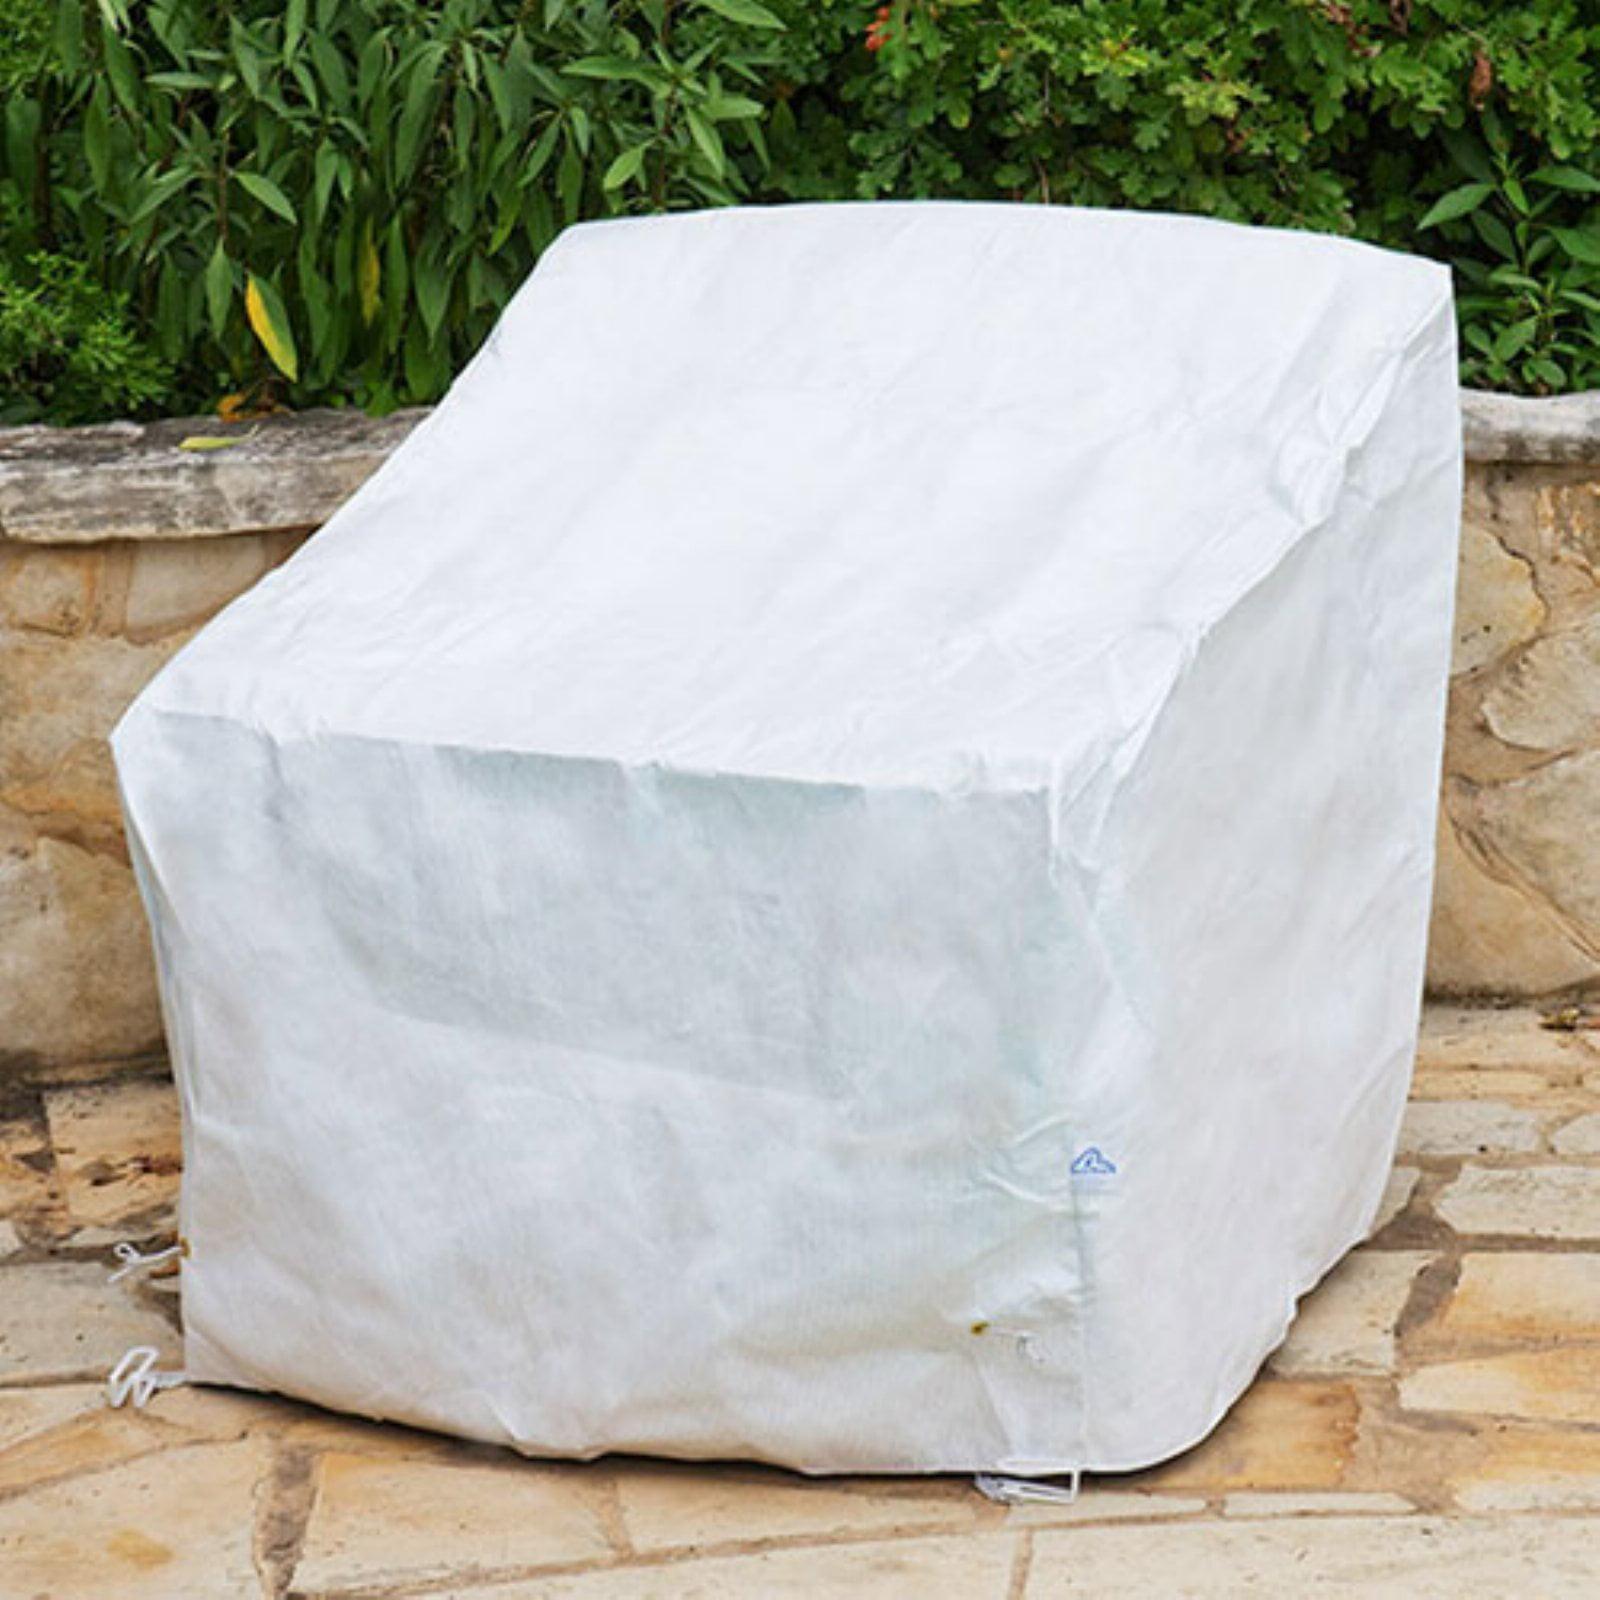 KoverRoos DuPont Tyvek White Deep Seating Chair Cover by KoverRoos